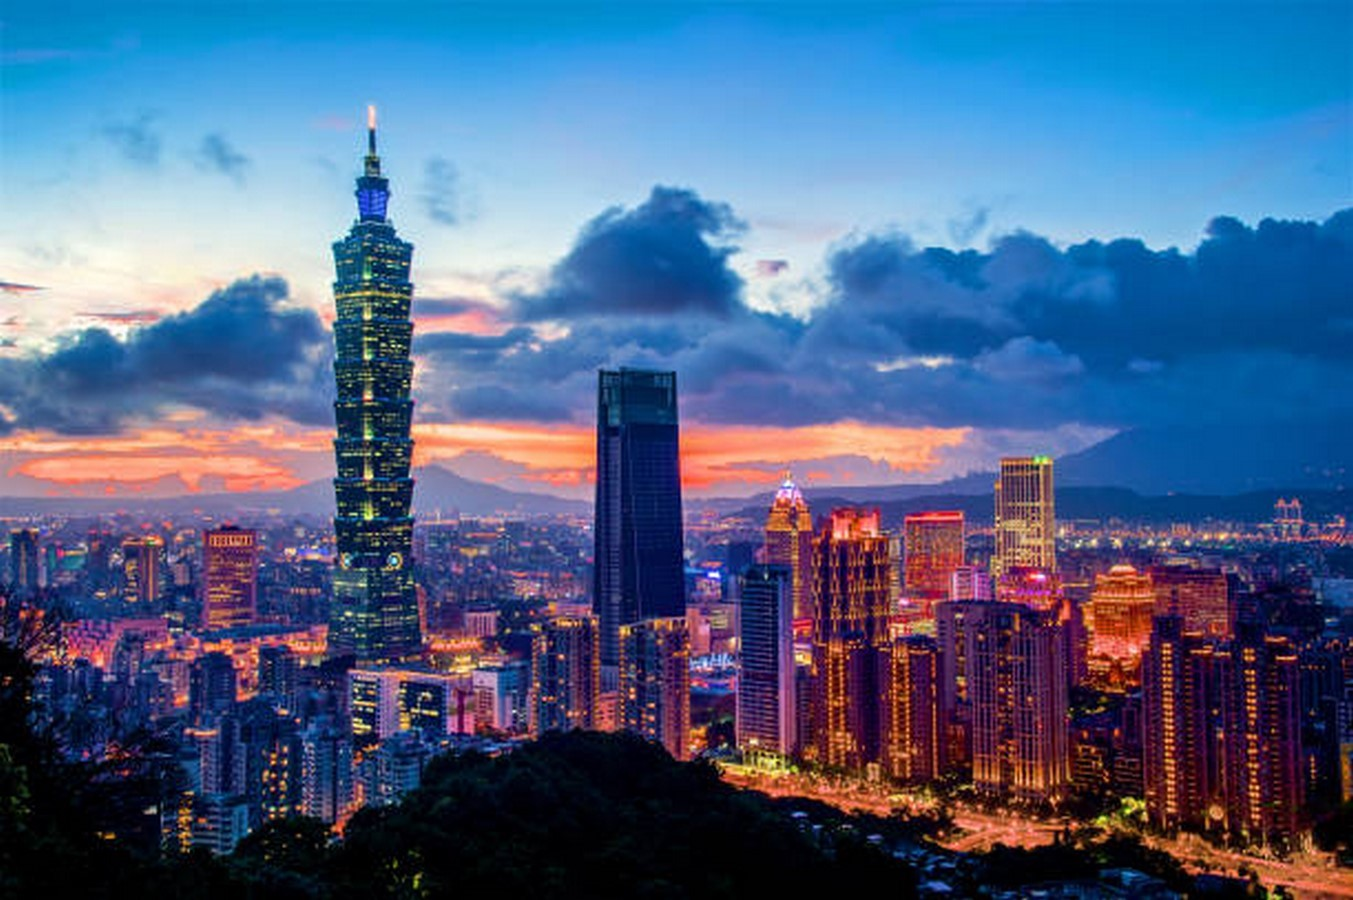 Taipei 101 - Sheet3